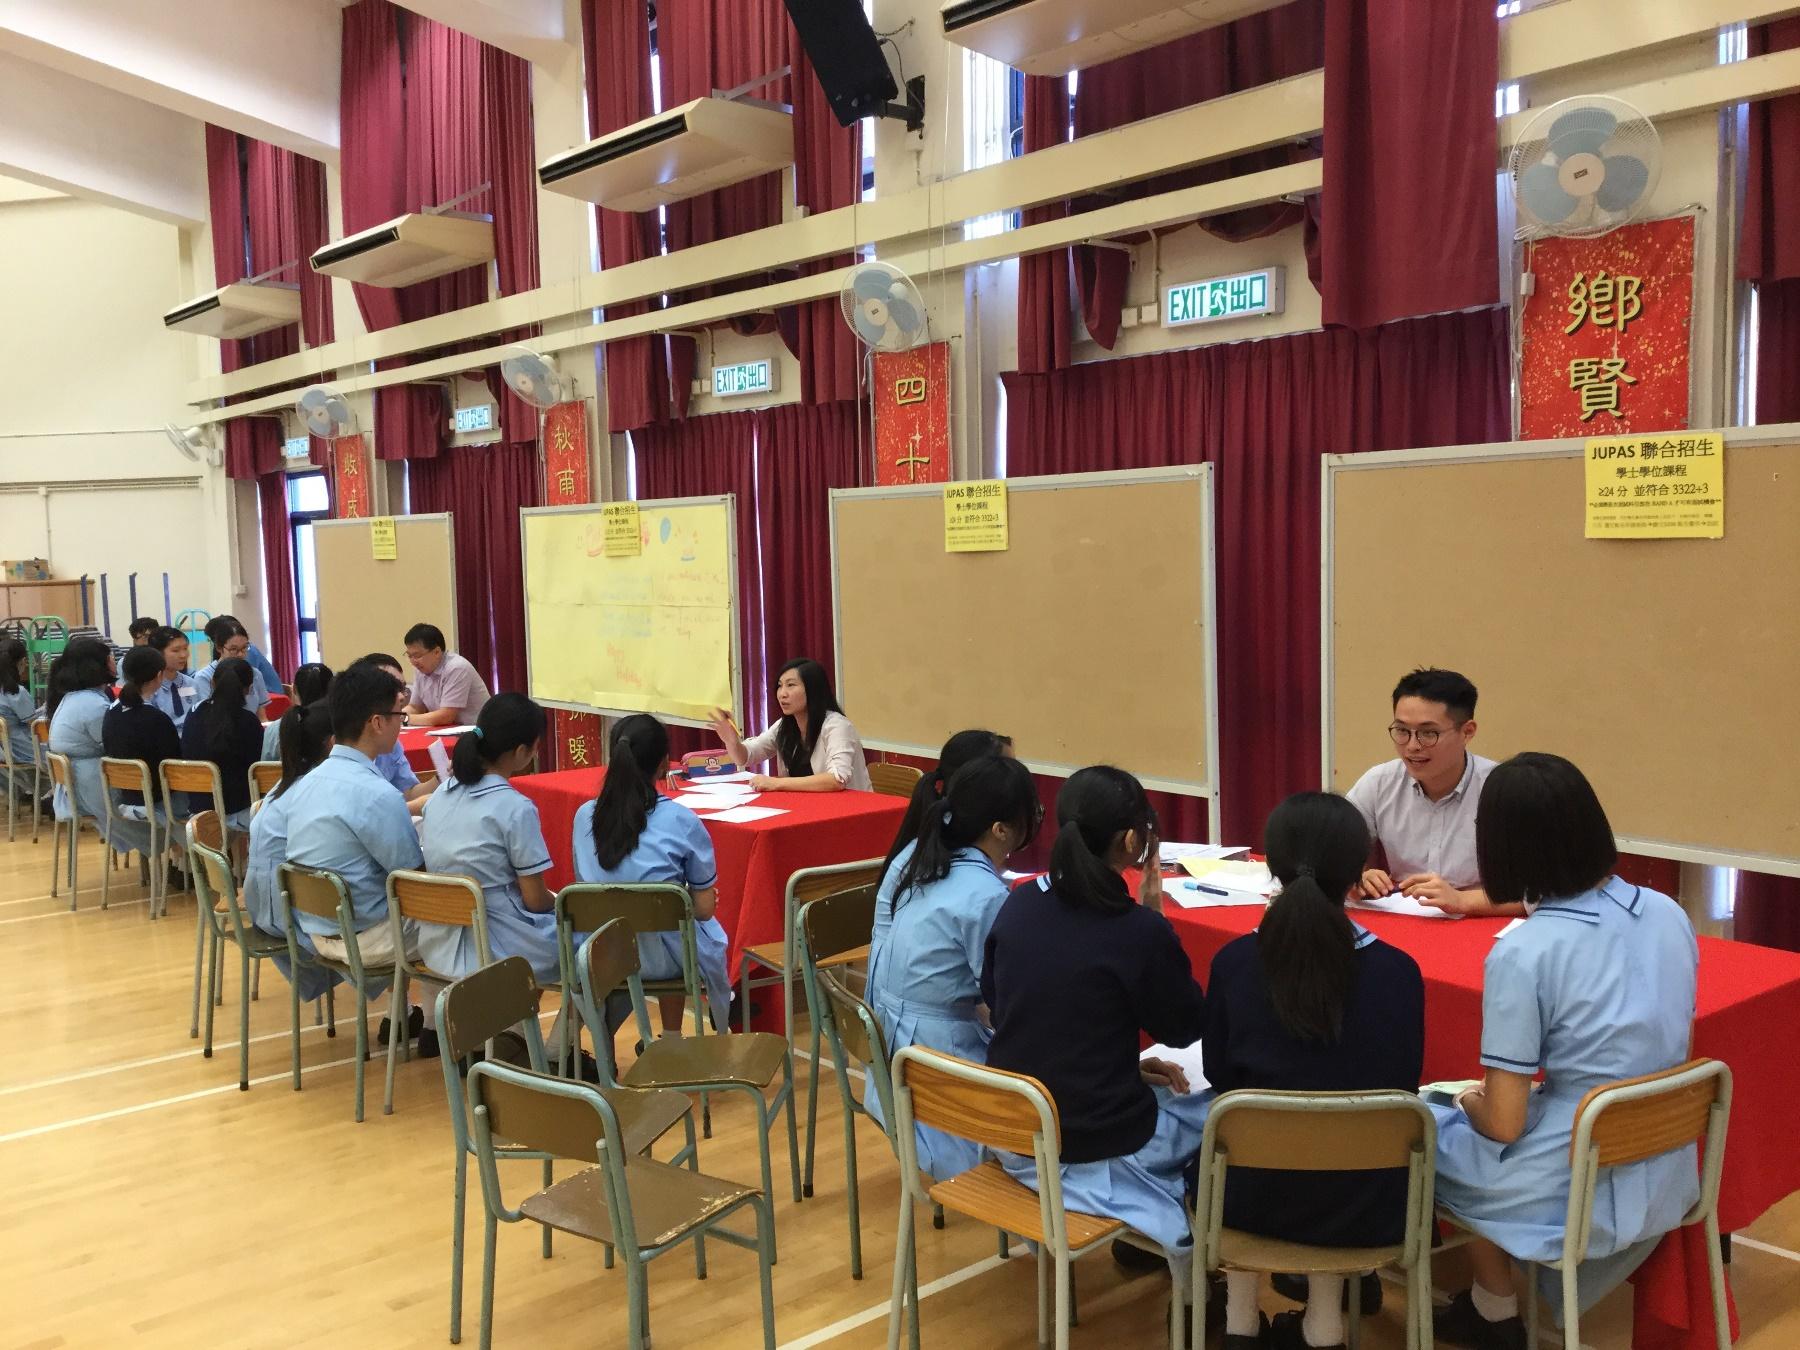 http://npc.edu.hk/sites/default/files/img_0390.jpg